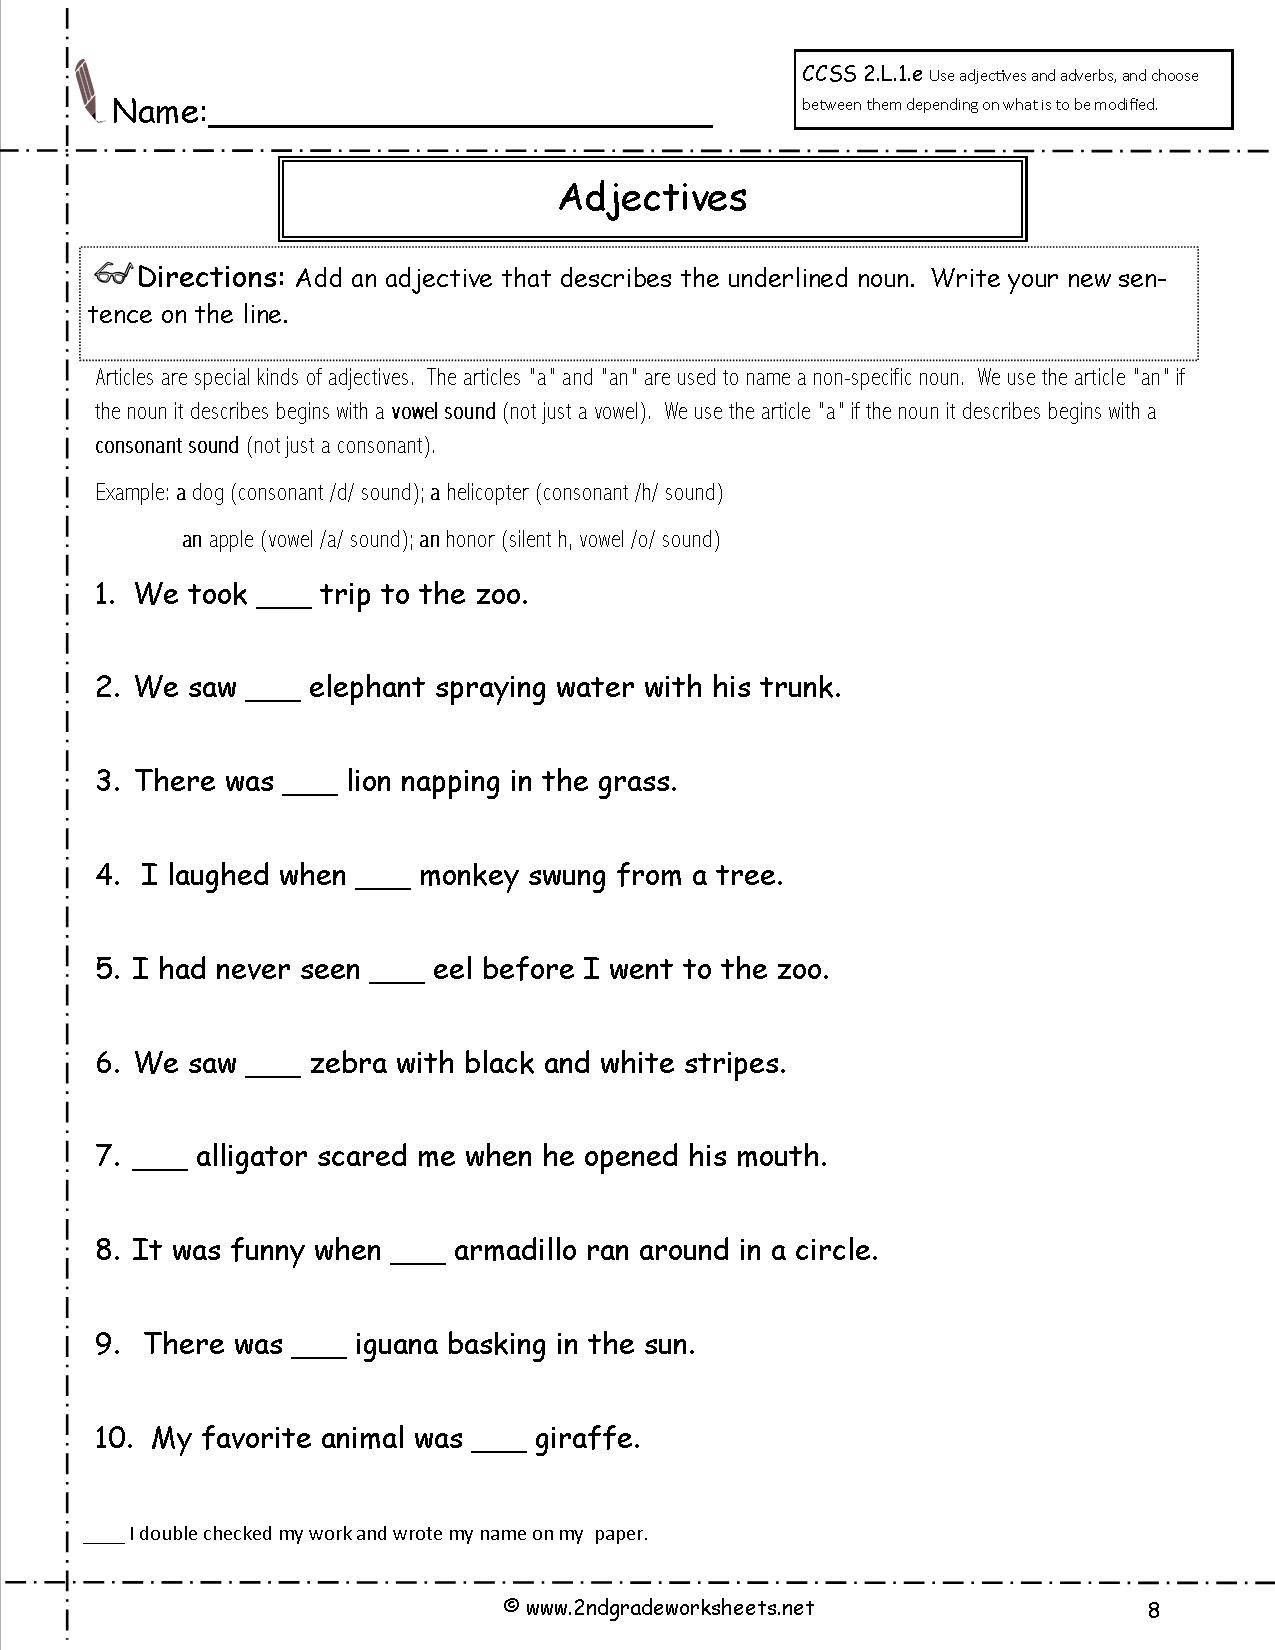 Free Language/grammar Worksheets And Printouts | Free English Grammar Exercises Printable Worksheets